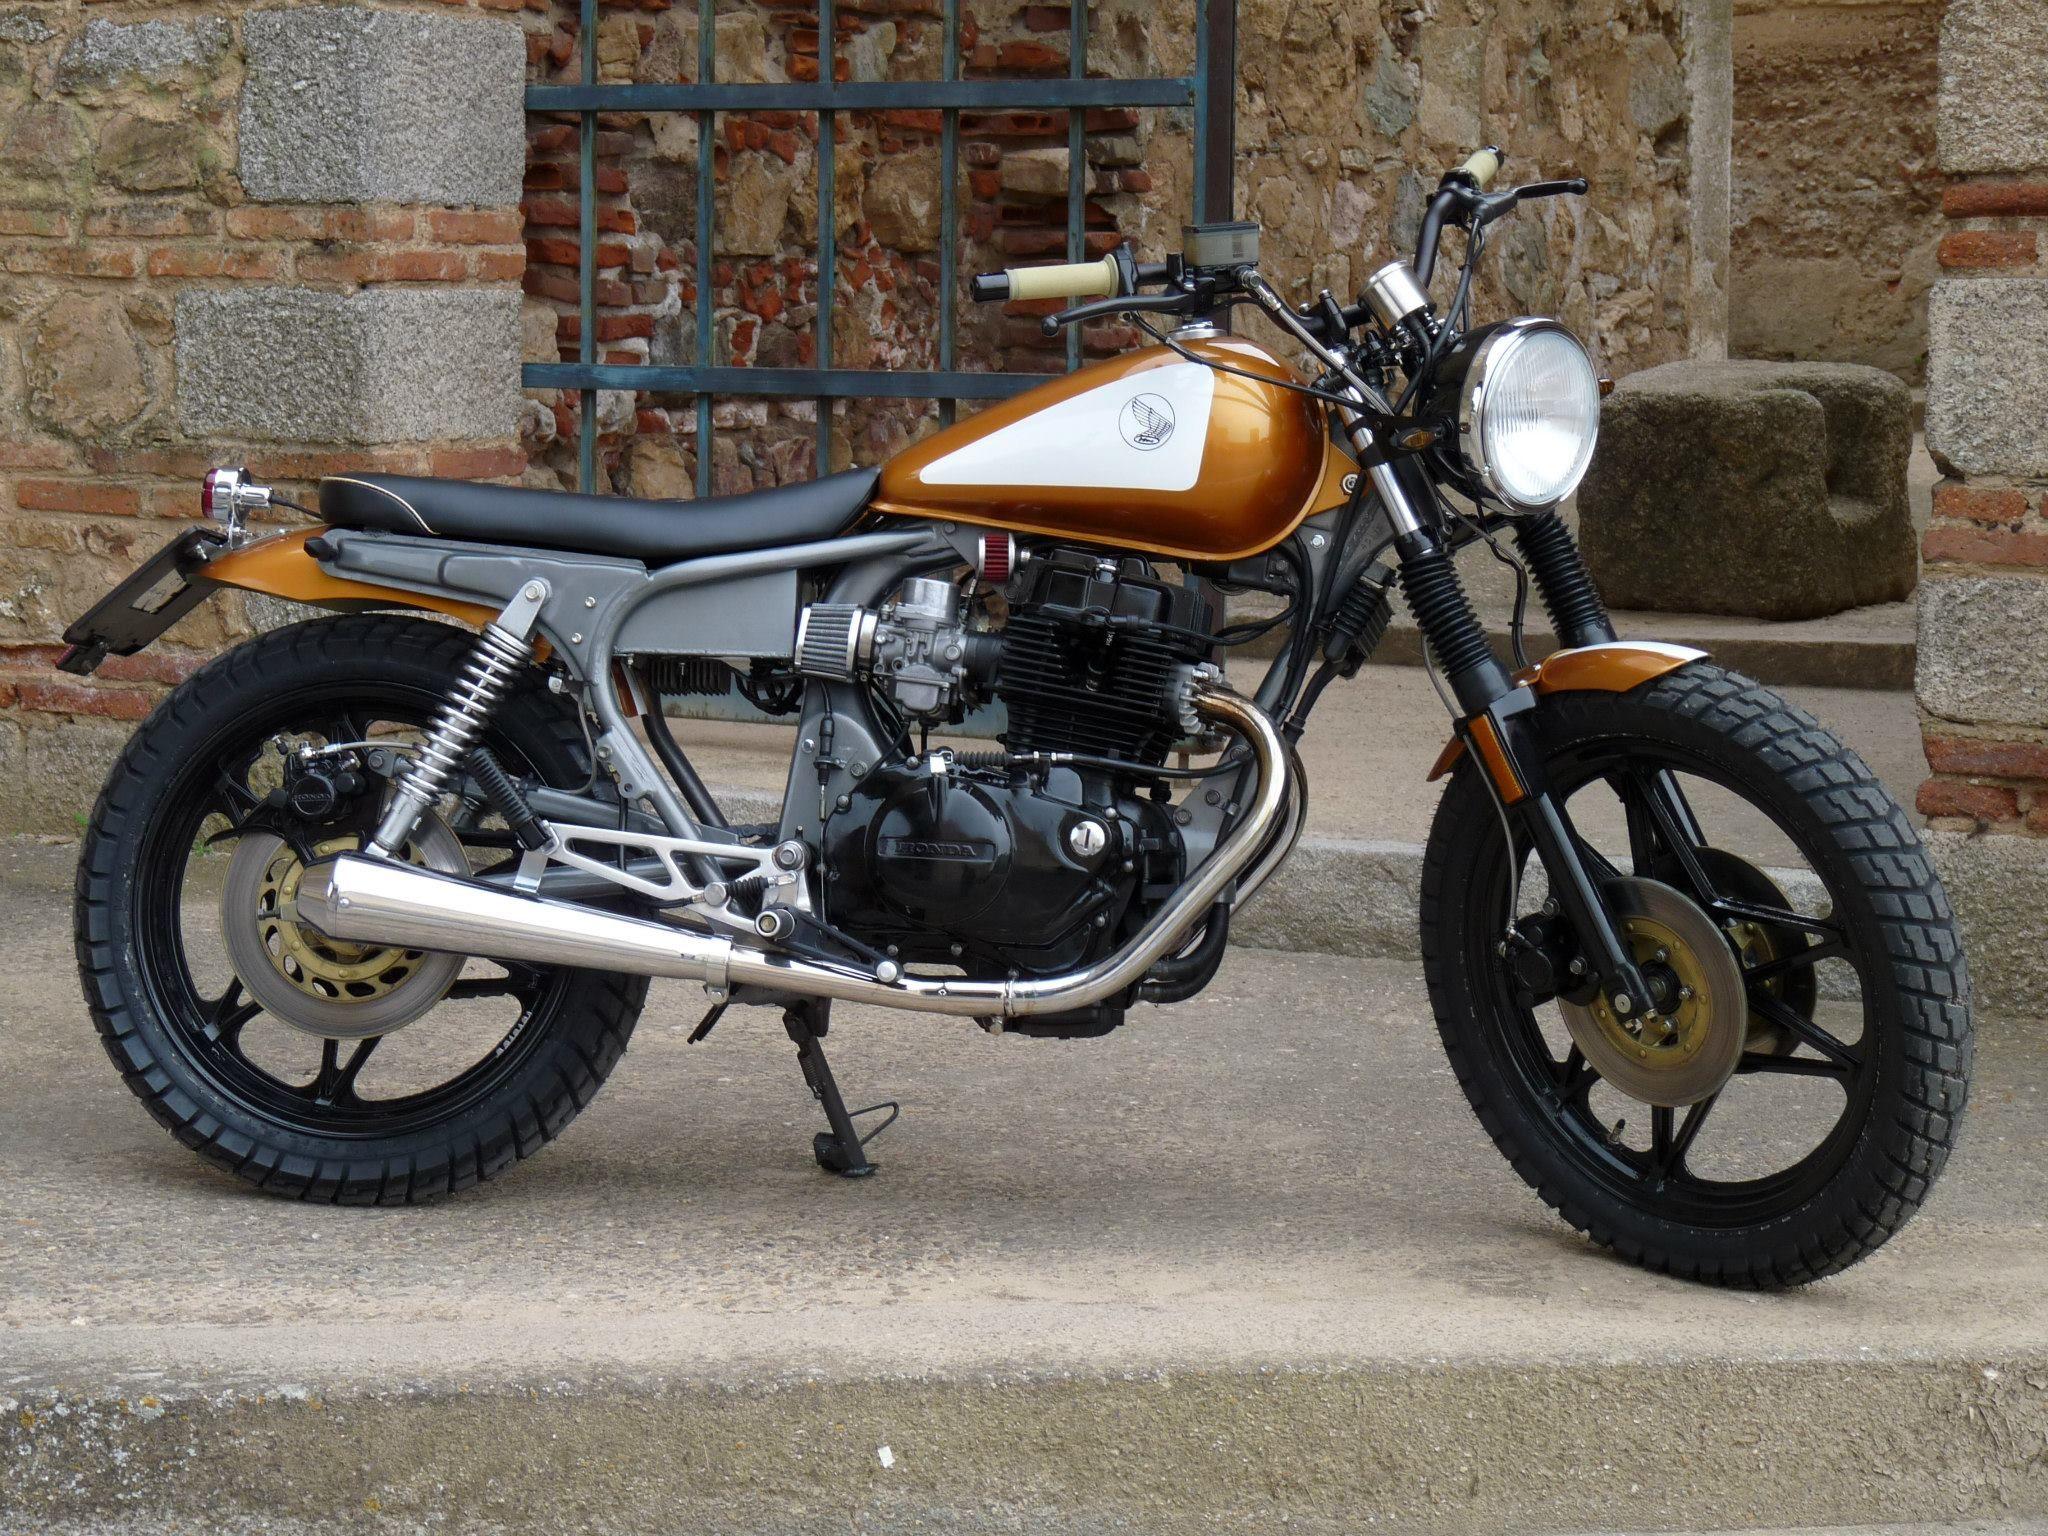 Honda Cm400t Cb400t Rad Custom Cafe Build 12 Jpg 2 048 1 536 Pixels Honda Cb Cafe Racer Honda Cafe Racer Motorcycle [ 1536 x 2048 Pixel ]